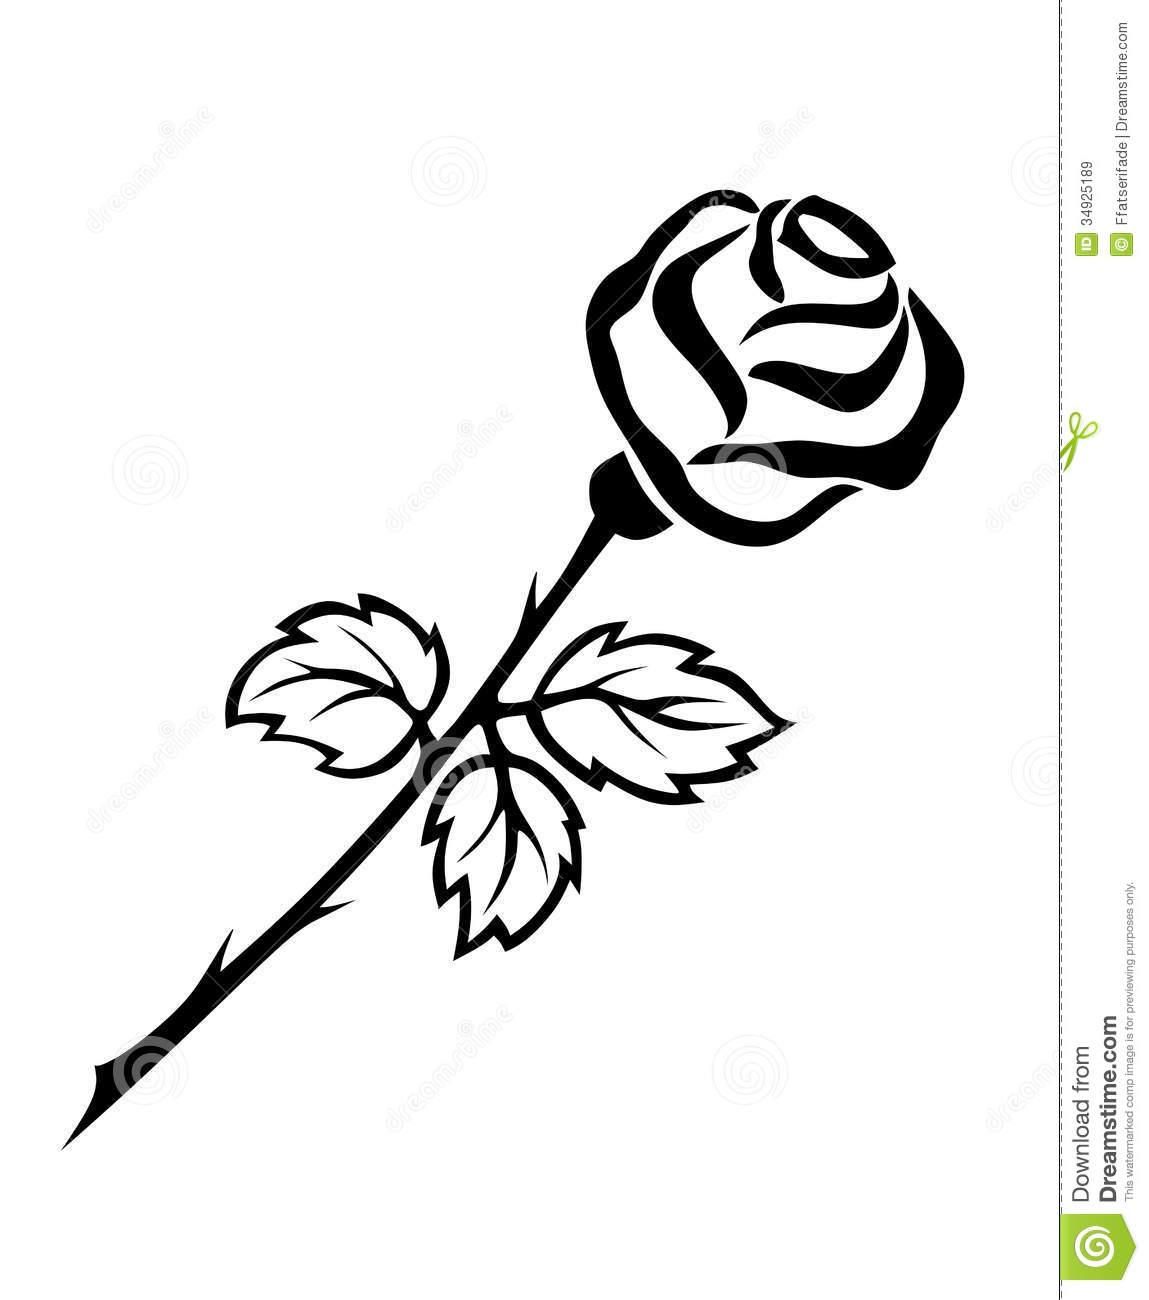 1149x1300 Hoontoidly Single Black Rose Clip Art Images